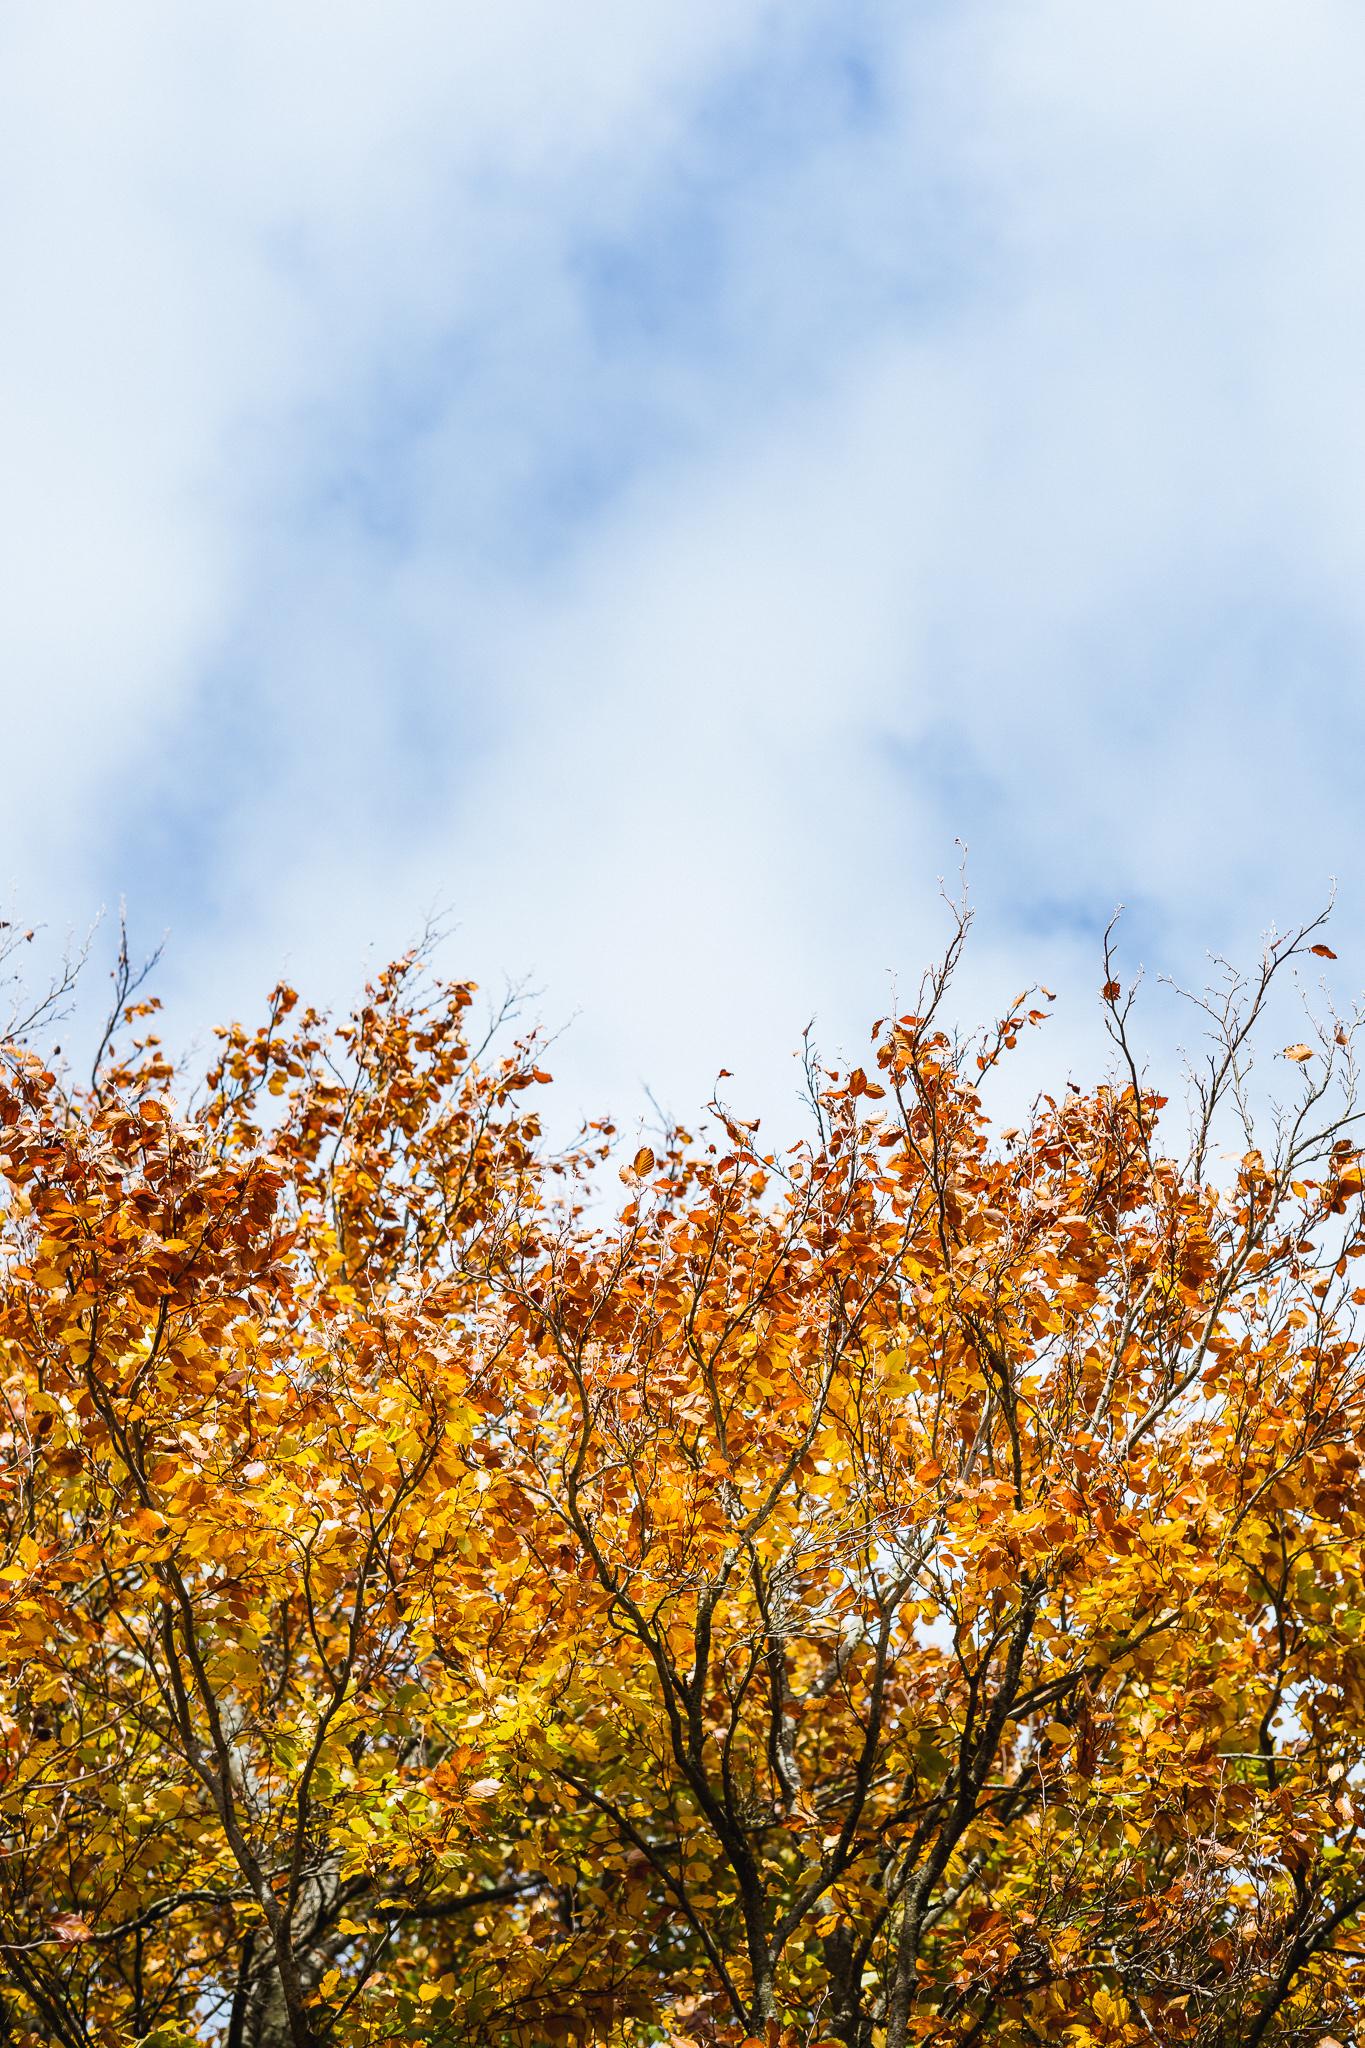 Combe_Grove_Bath_Wellness_Walk_Space_to_Breathe_Autumn